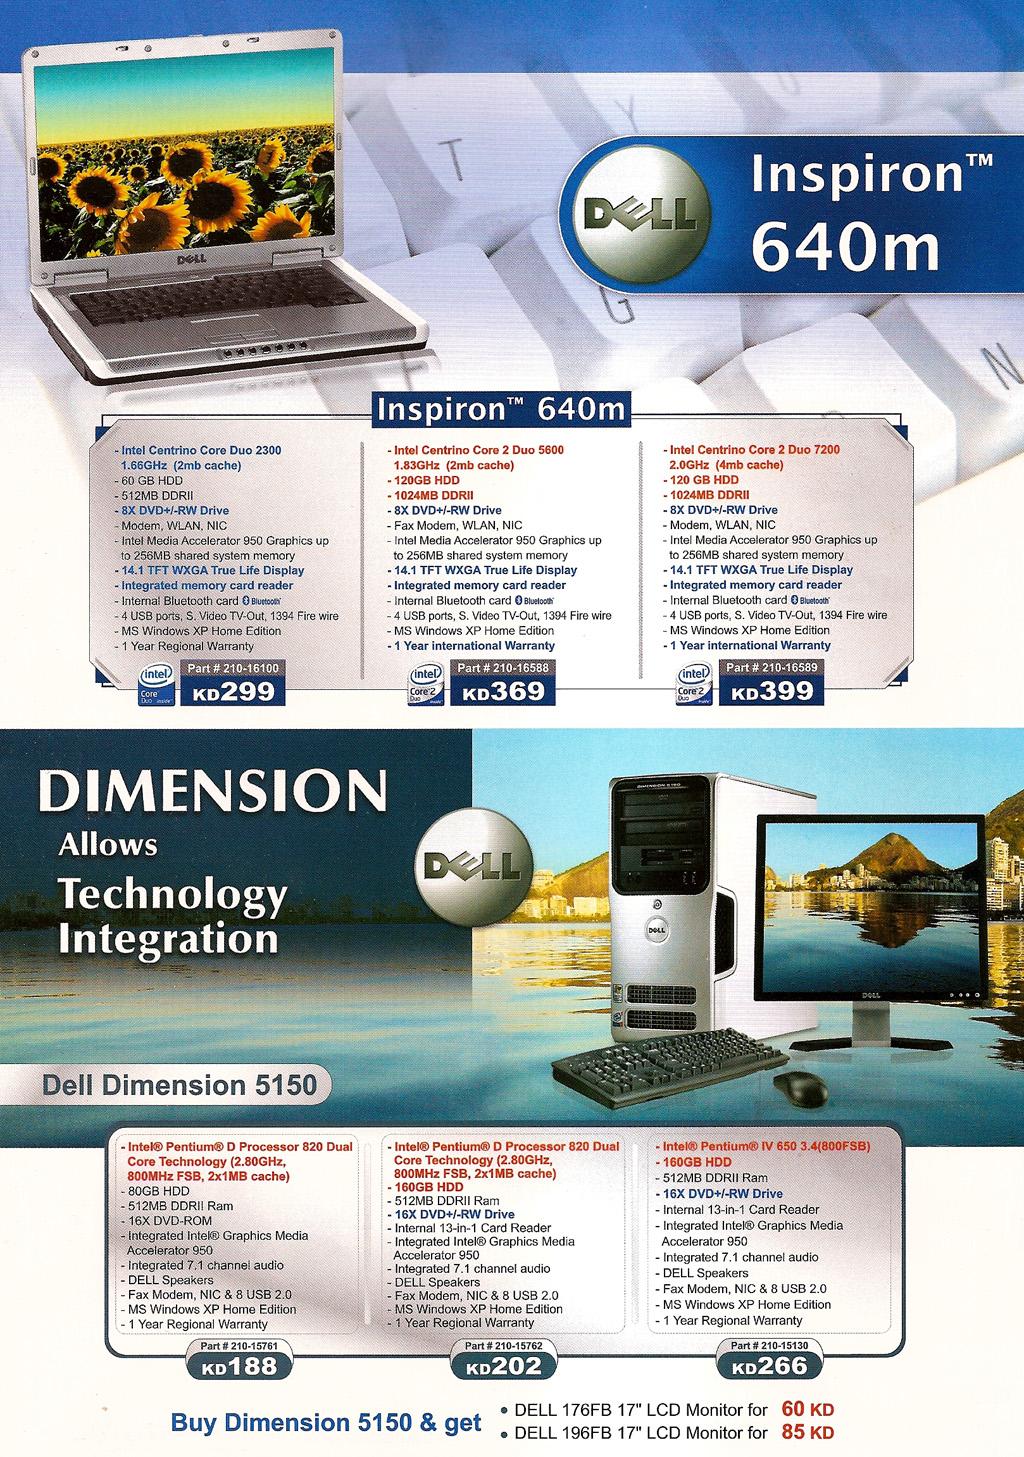 Zak Solutions For Computer Systems - زاك سلوشنز ﻷنظمة الكمبيوتر - زيد و بشر الكاظمي